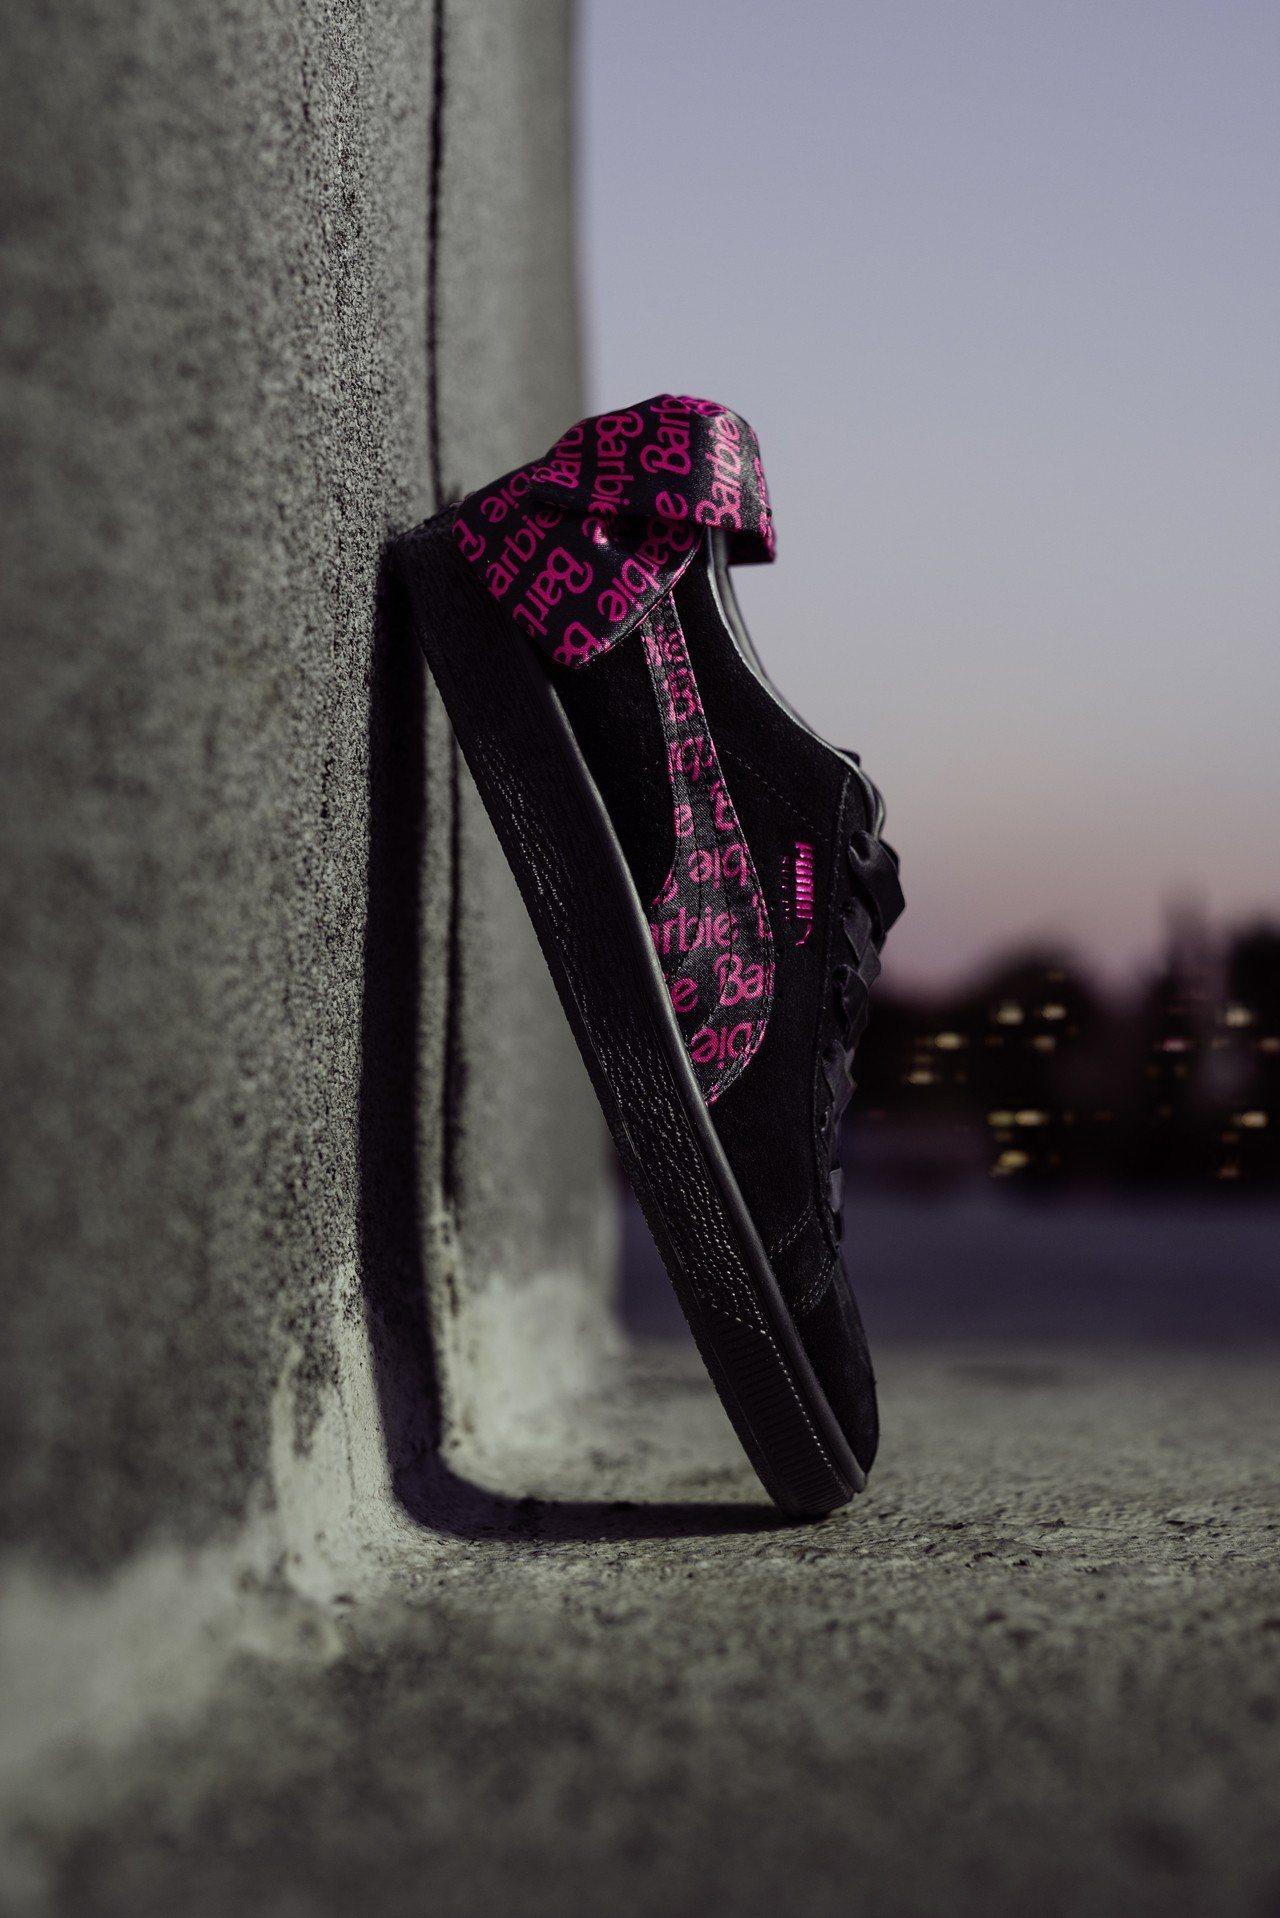 Puma與芭比娃娃聯名推出Suede鞋款3,580元。圖/Puma提供